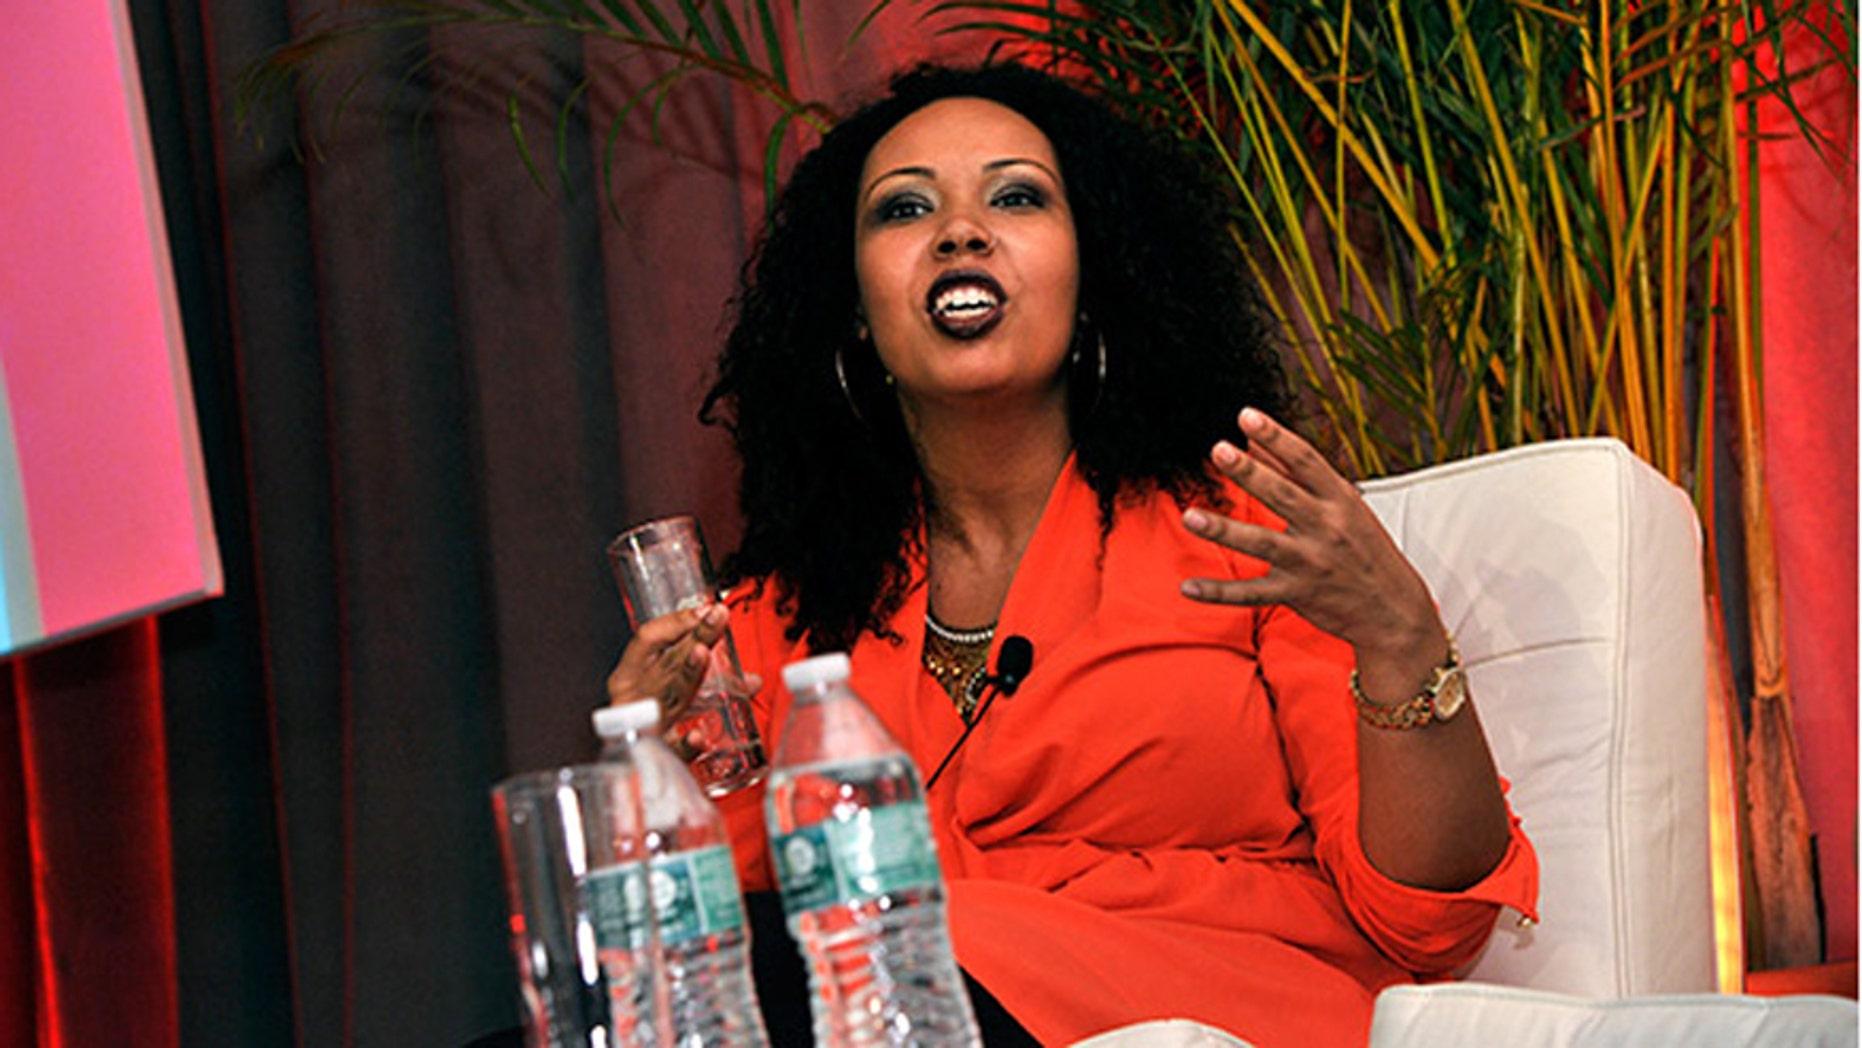 Jamilah Lemieux speaking at a panel during EMILY's List 30th Anniversary Gala at Washington Hilton on March 3, 2015 in Washington, DC.